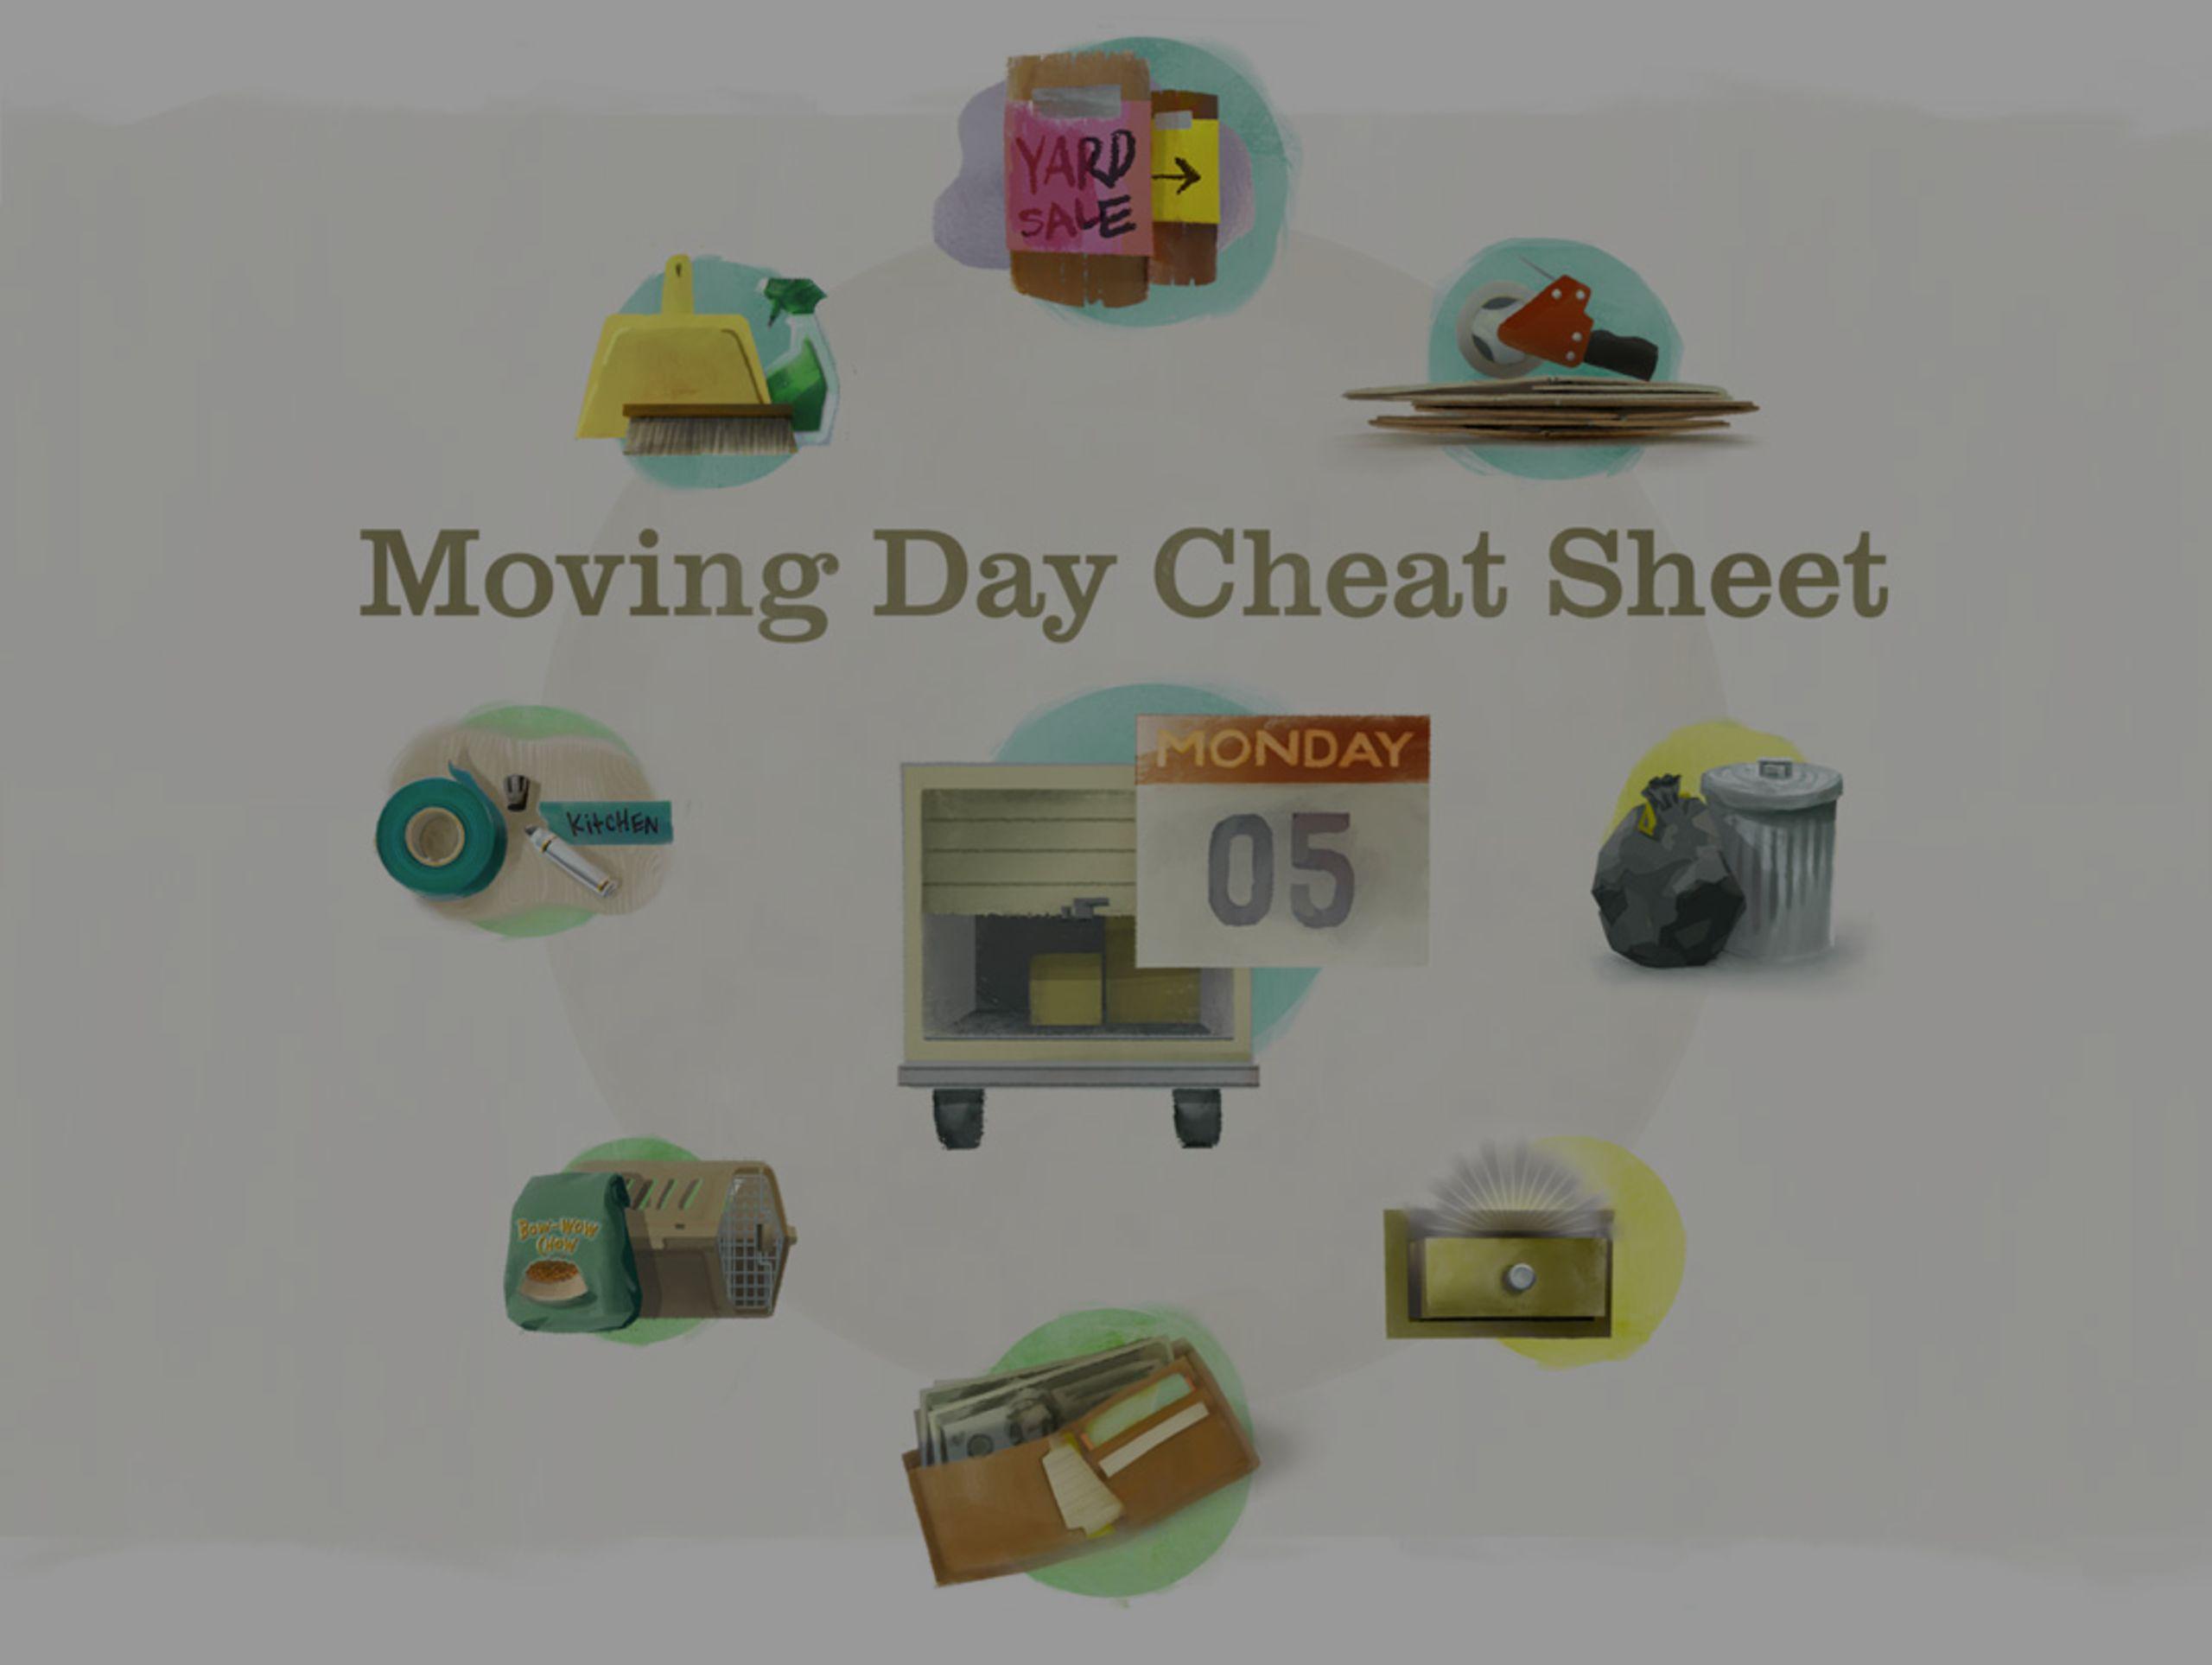 Moving Day Cheat Sheet